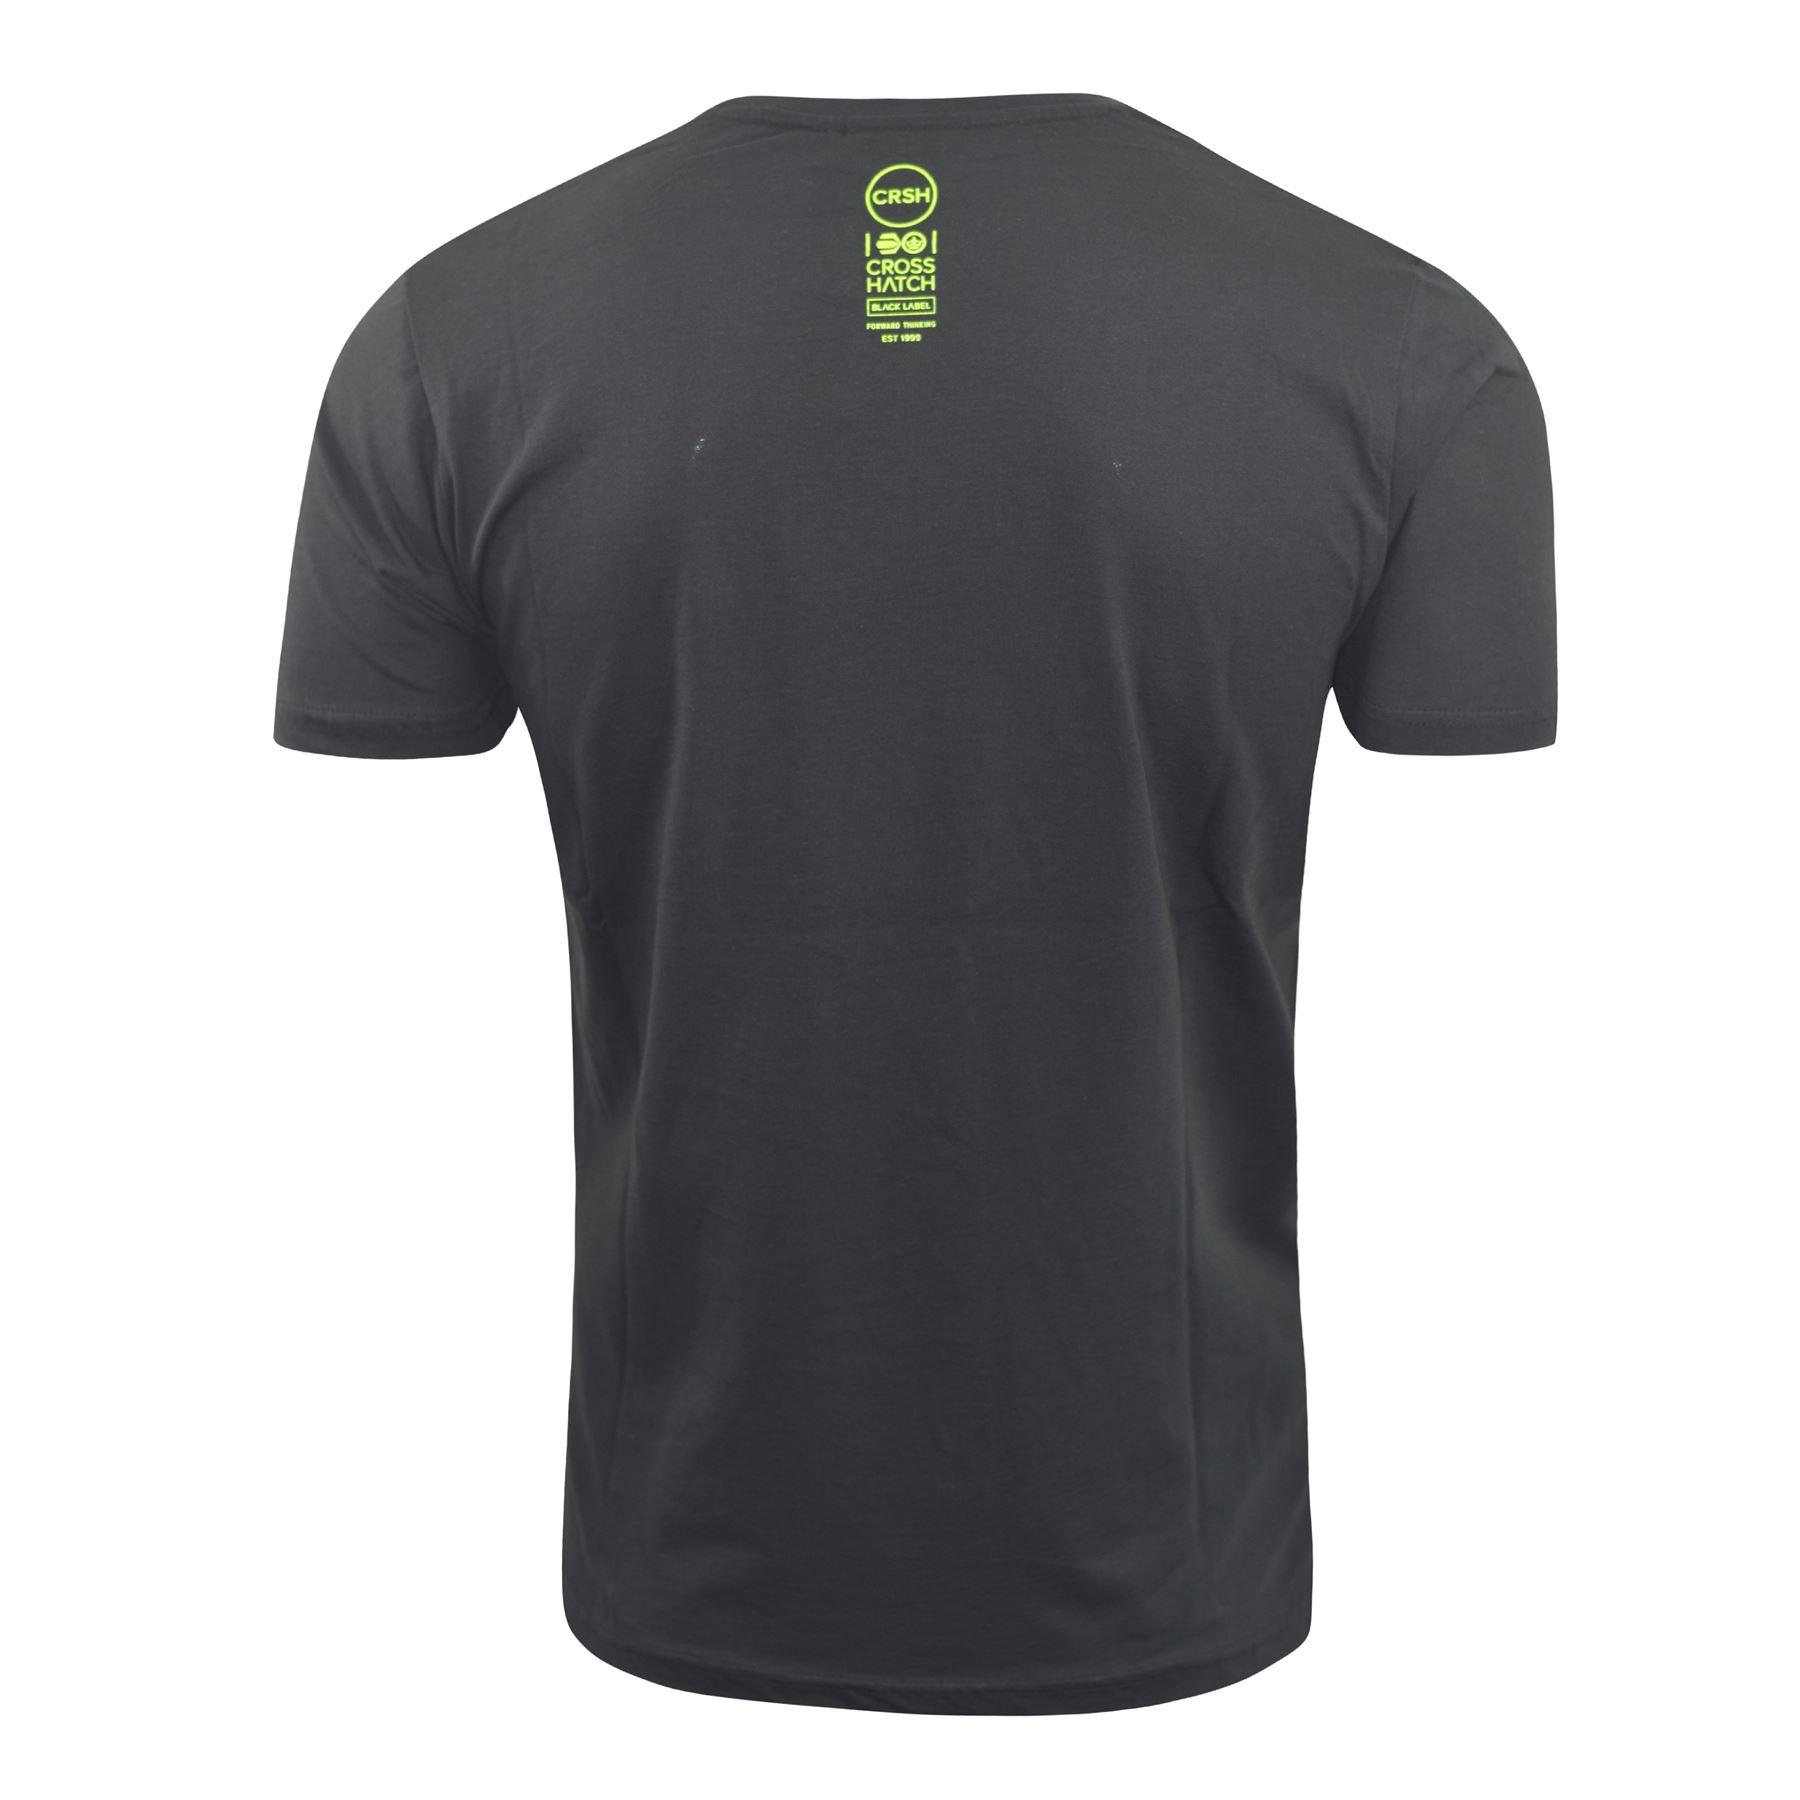 Mens-Crosshatch-T-Shirt-Graphic-Crew-Neck-Tee-Top-Kaeffmore thumbnail 4